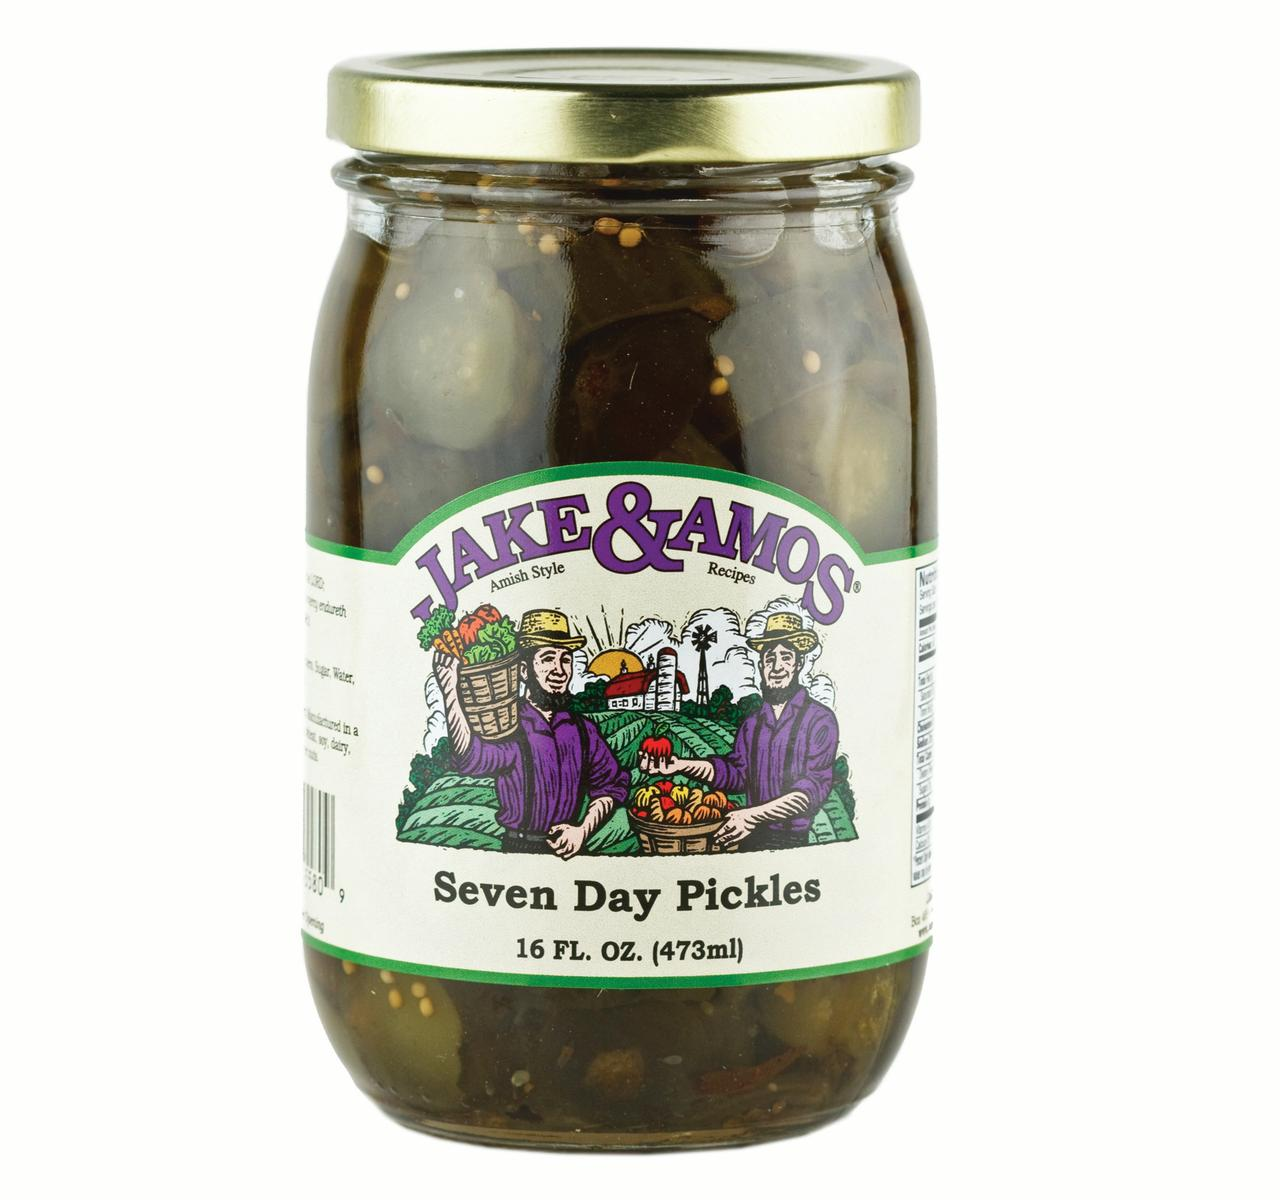 Jake & Amos Seven Day Pickles 16 oz. (3 Jars)